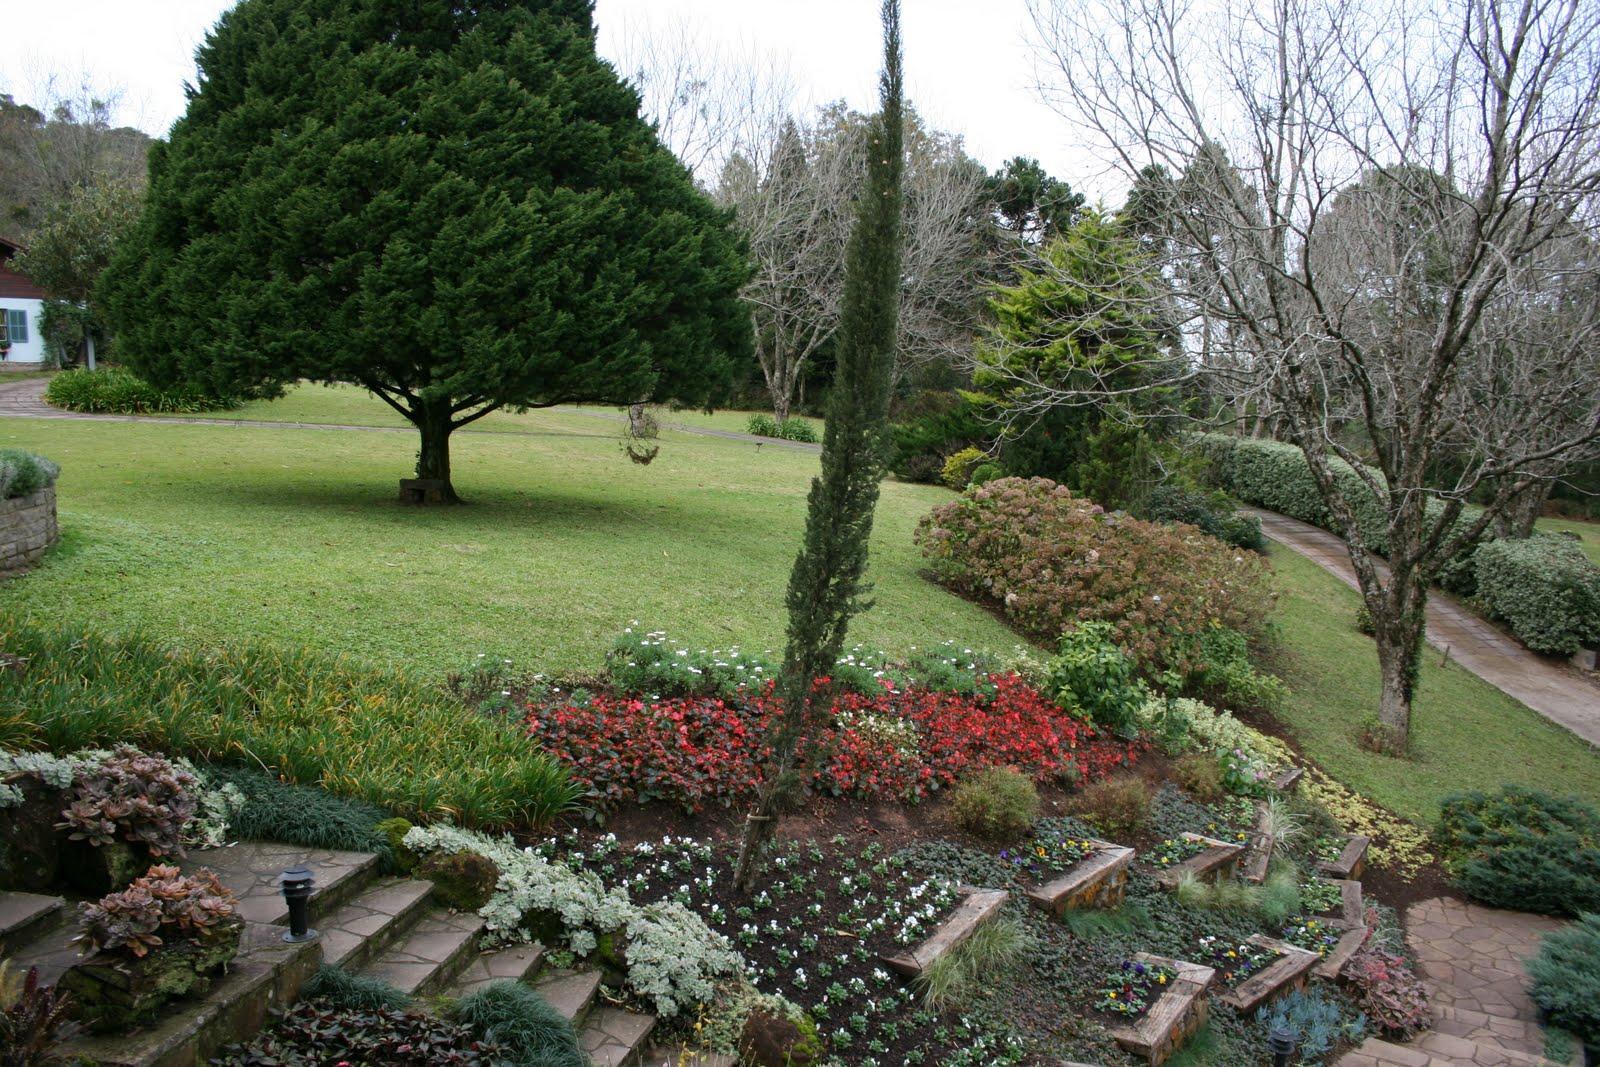 Le jardin parque de lavanda gramado viagem e viagens - Le jardin de valerie ...